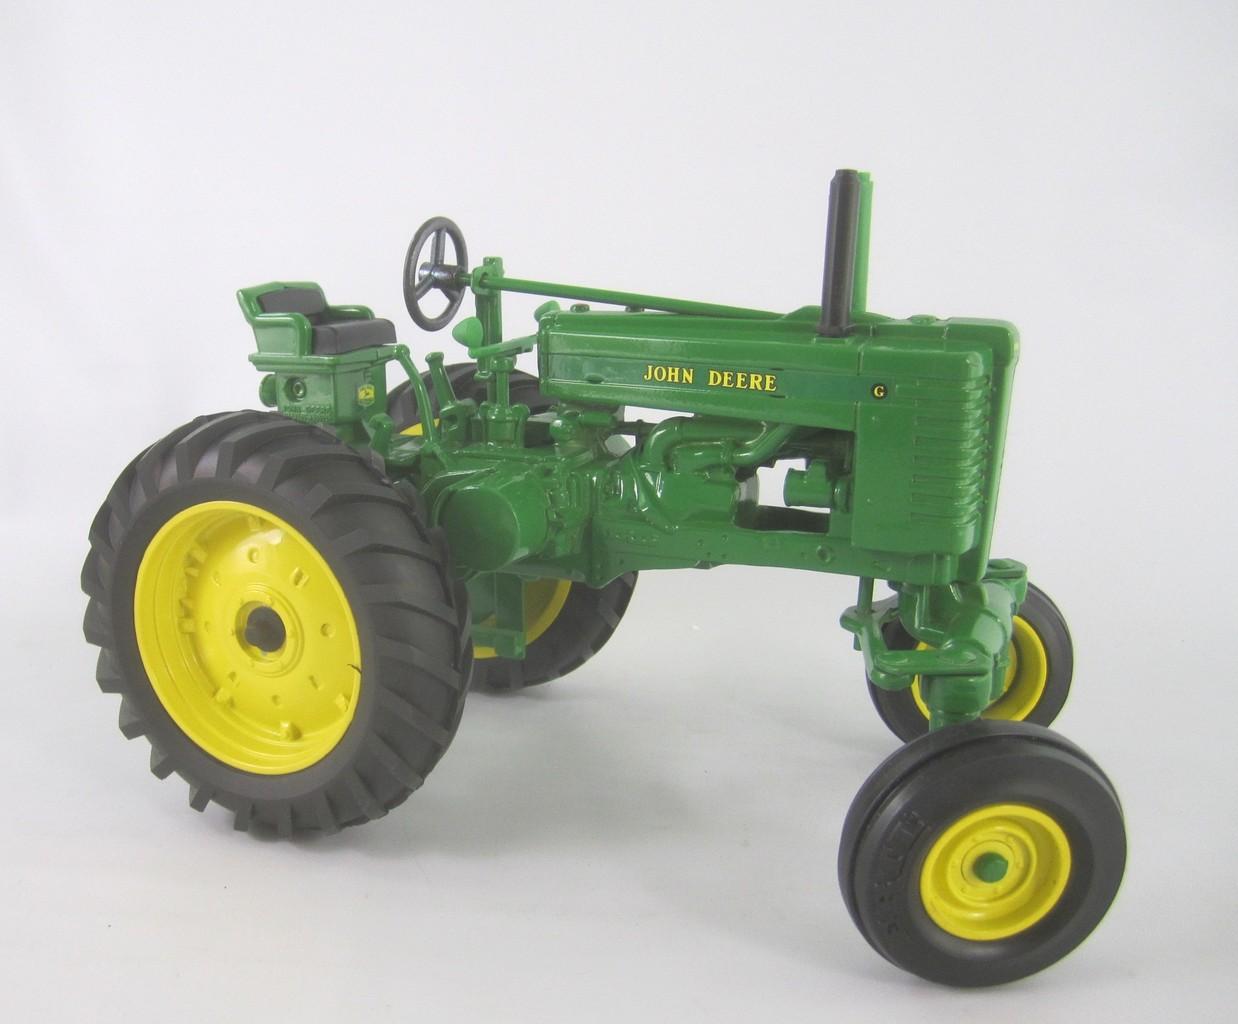 john deere two-cylinder letter series tractors